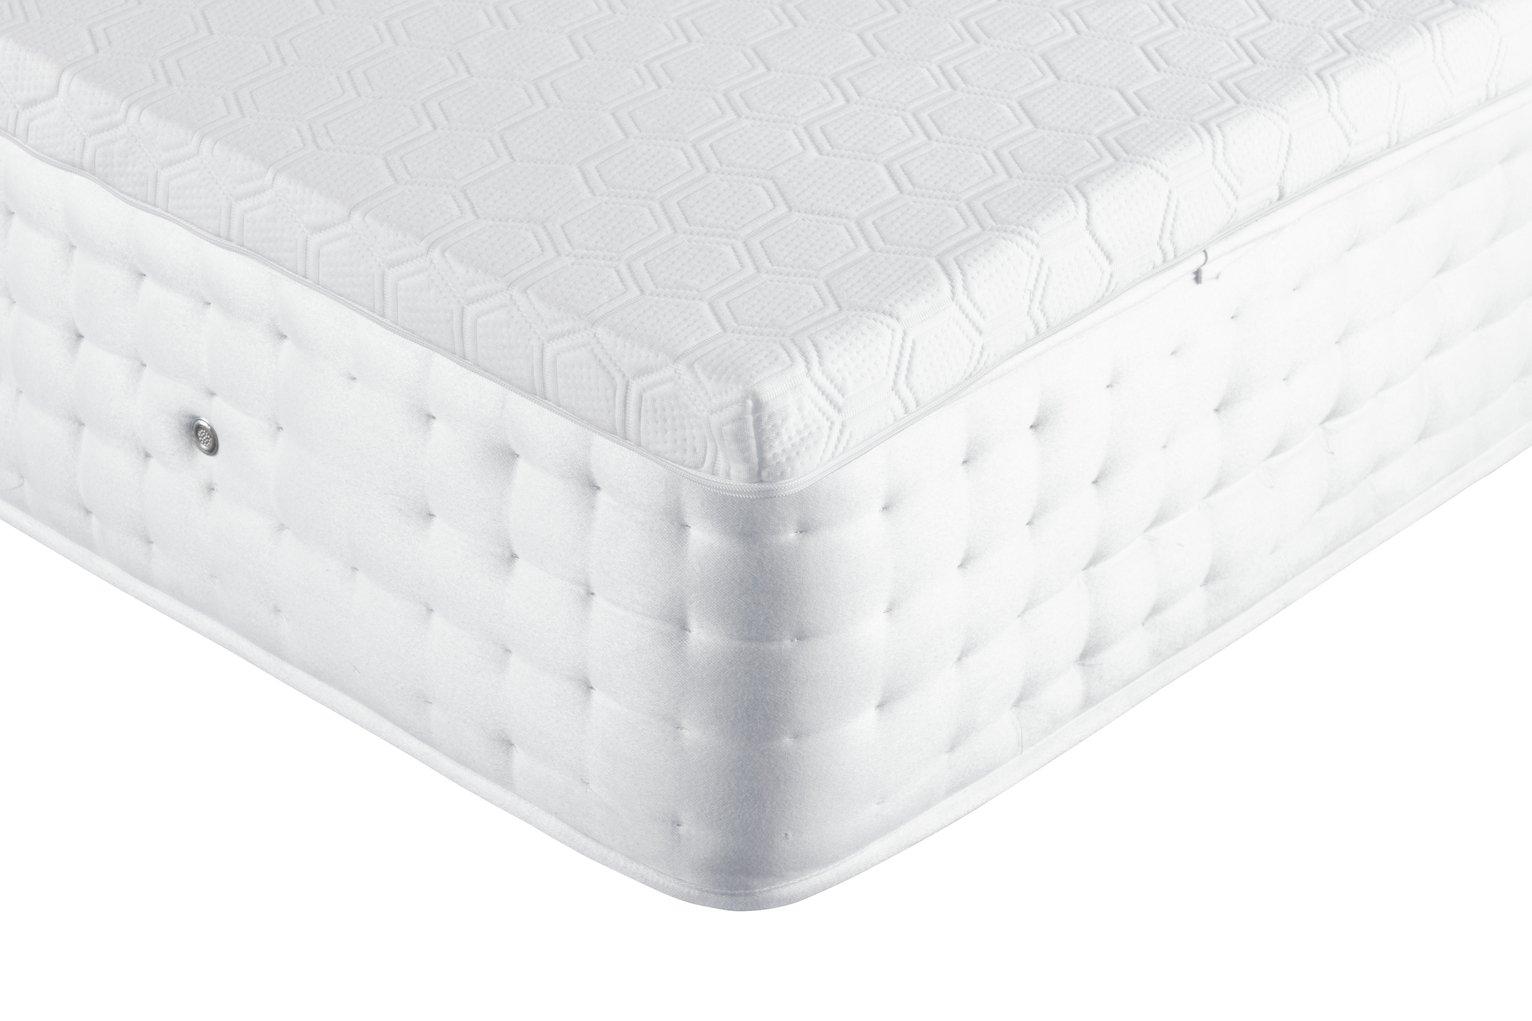 Argos Home Anti-Slip Memory Foam Mattress Topper - Superking